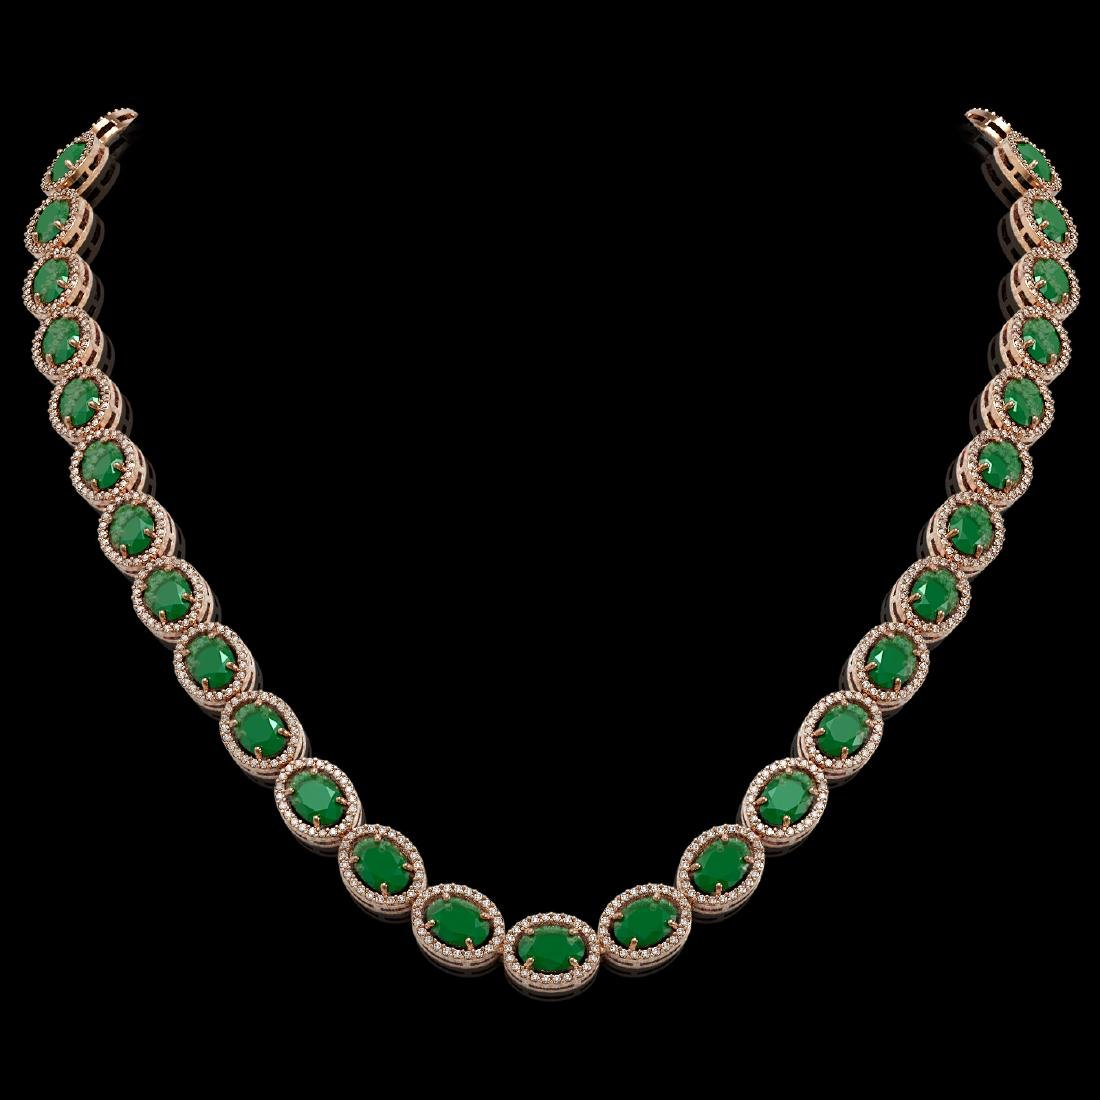 52.15 CTW Emerald & Diamond Halo Necklace 10K Rose Gold